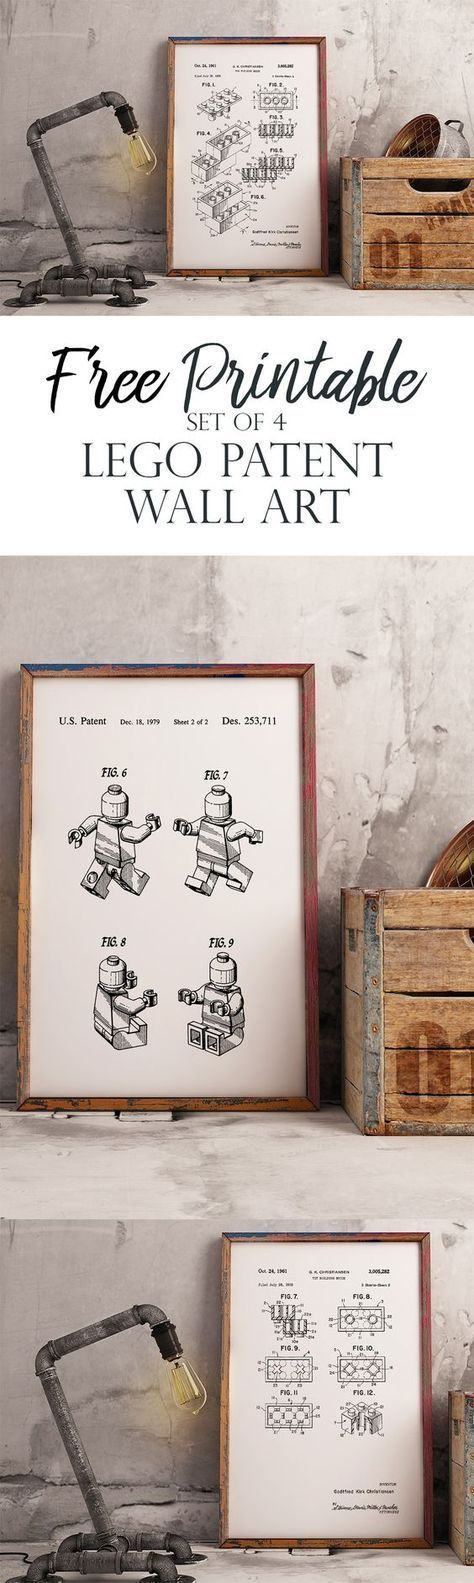 Lego Patente Wandkunst – Set von 4 – #Art #Lego #Patents #Set #Wall #walls,  #Art #basementbe…